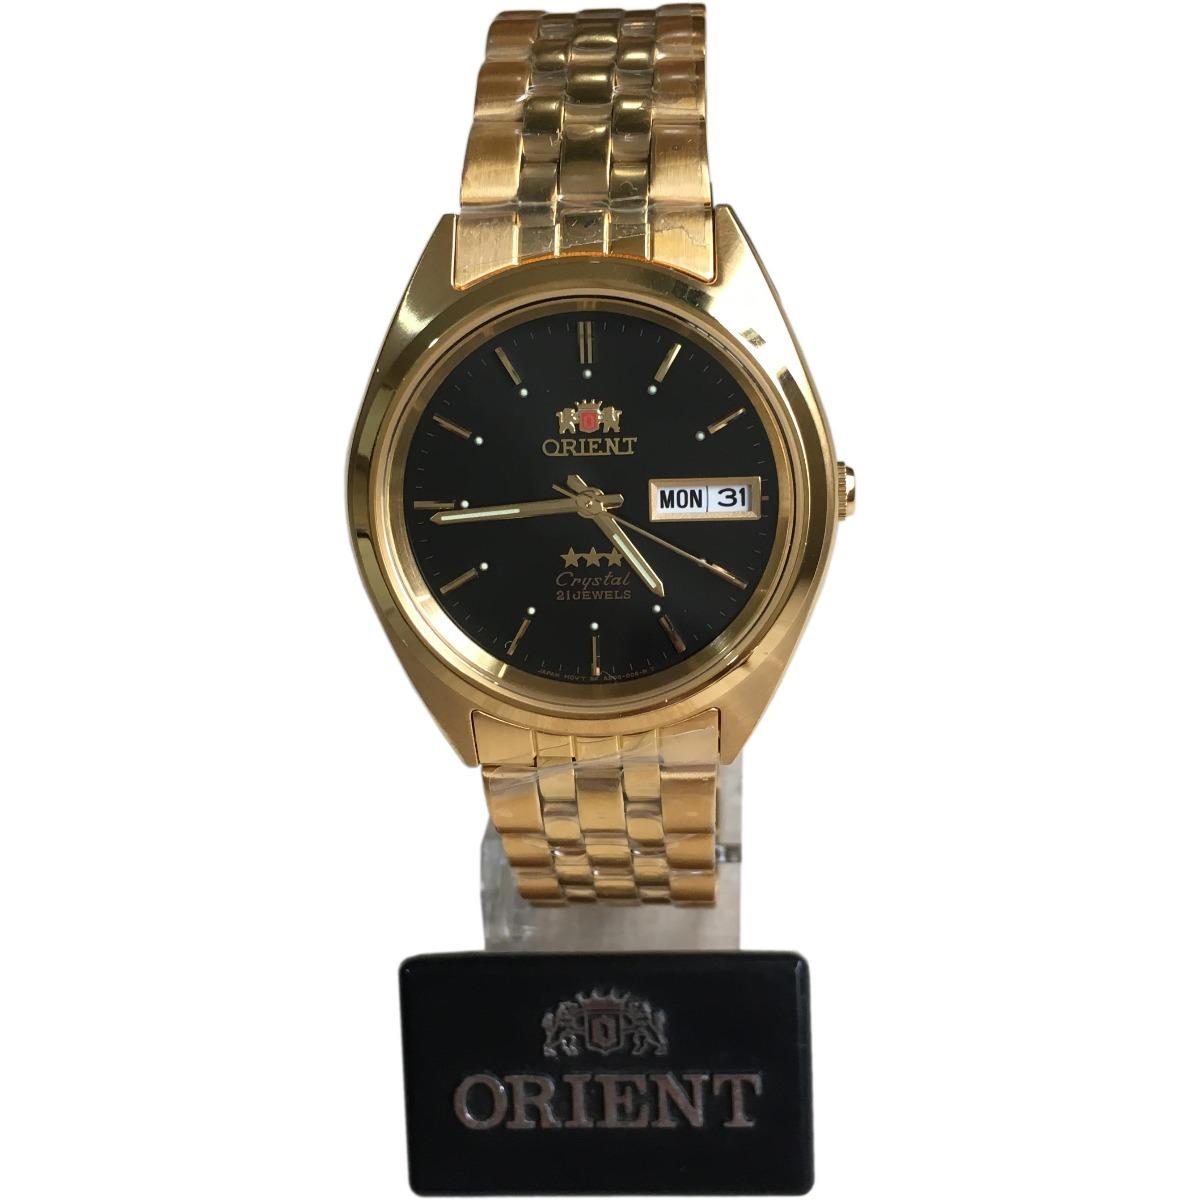 54dda9af60c relógio orient dourado fundo preto automático original c cx. Carregando  zoom.